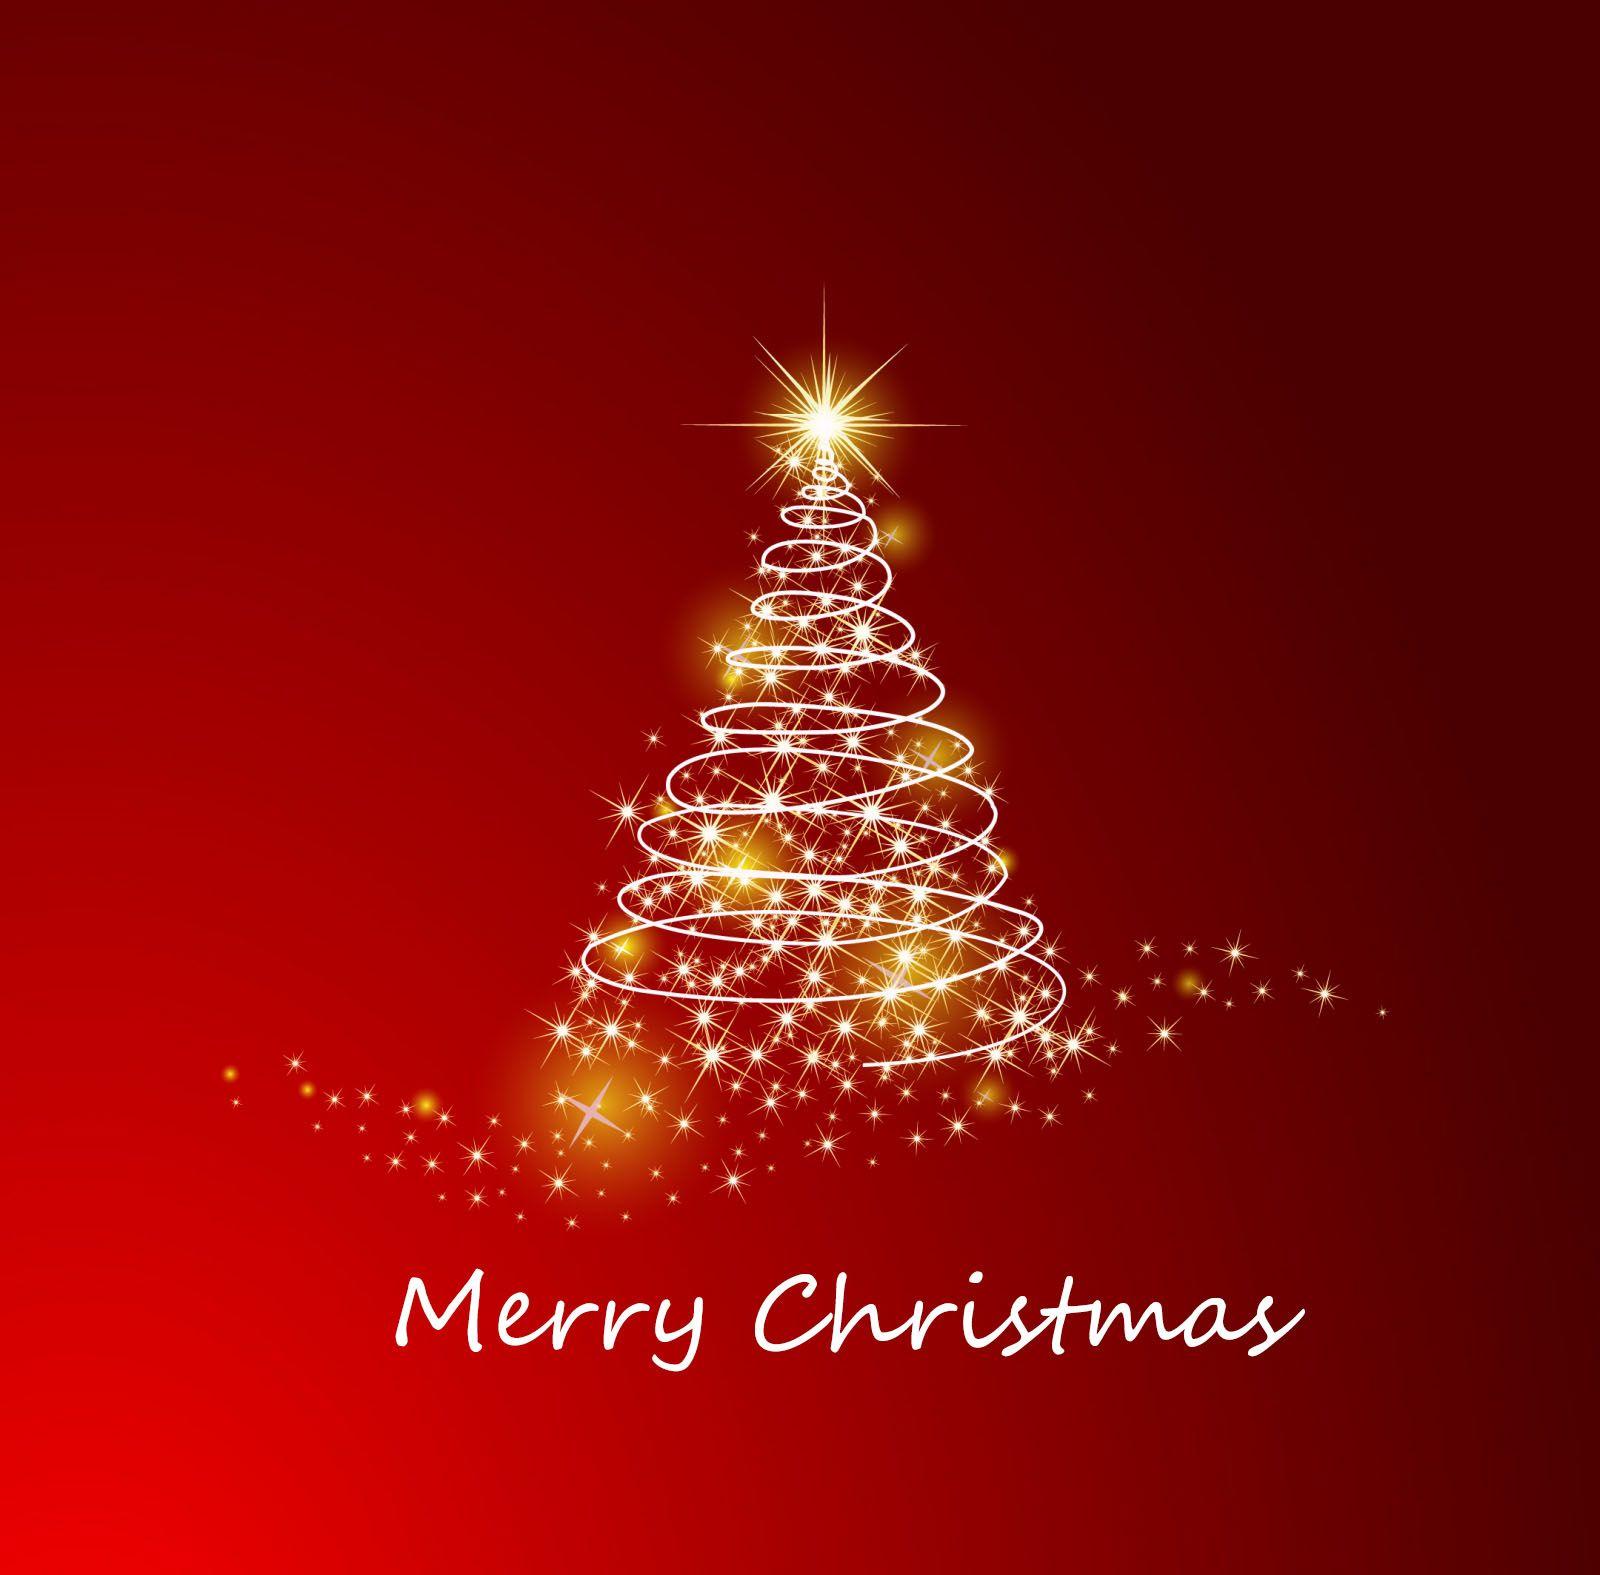 Merry Christmas Christmas Tree Background Christmas Card Template Christmas Tree